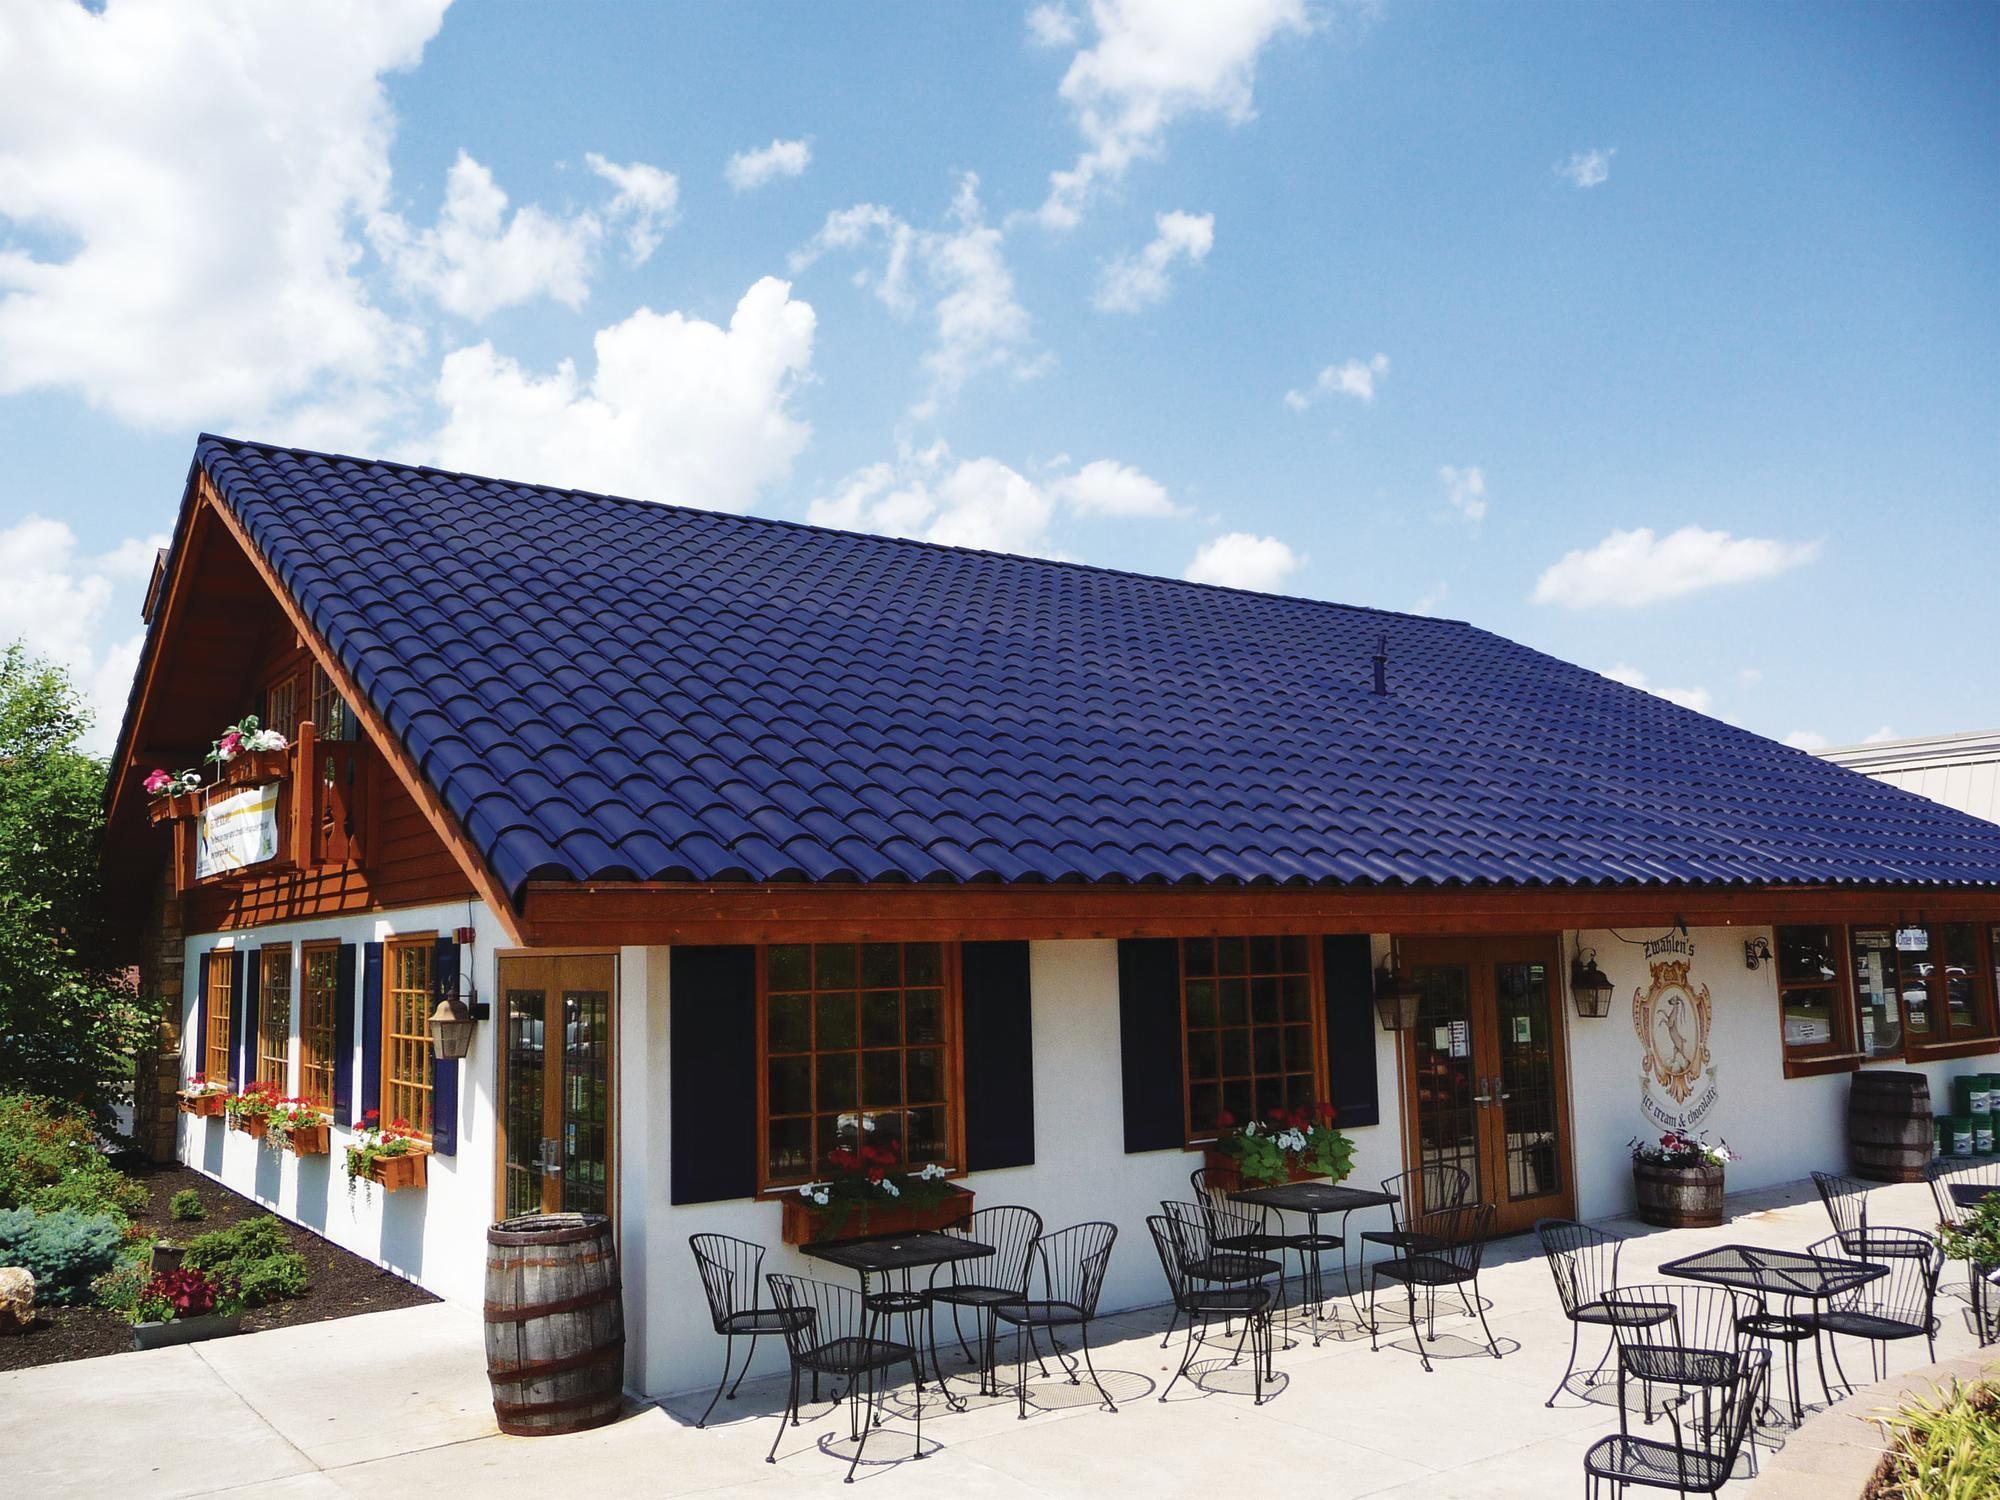 можно фото фасад дома с синей крышей займет